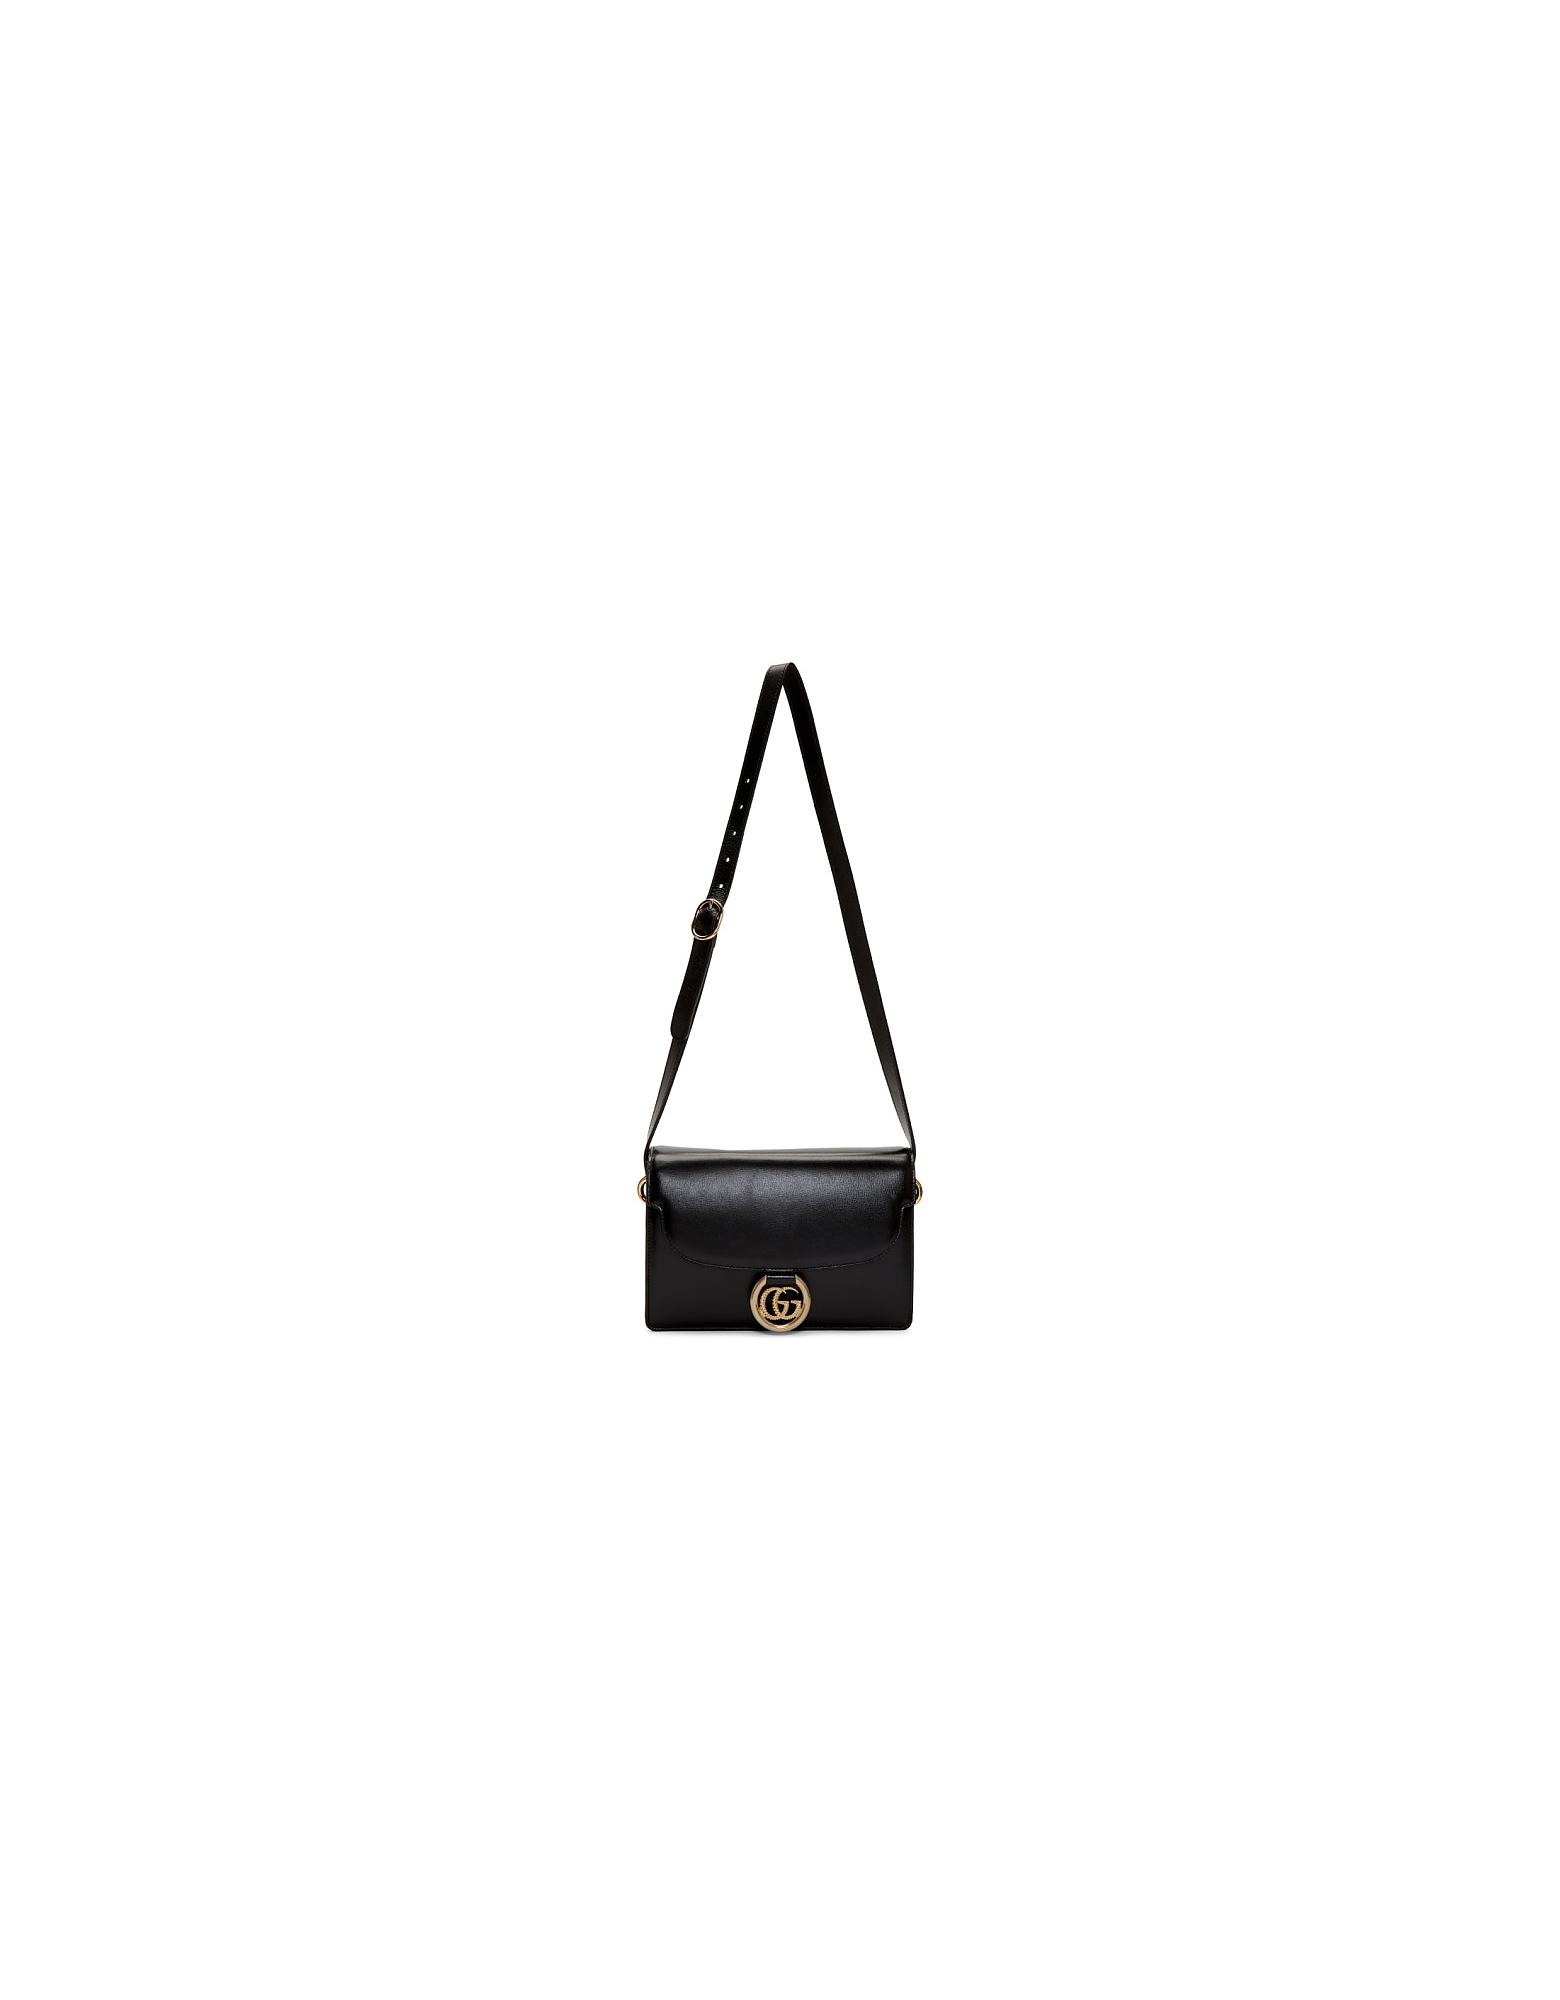 Gucci Designer Handbags, Black Small GG Ring Shoulder Bag